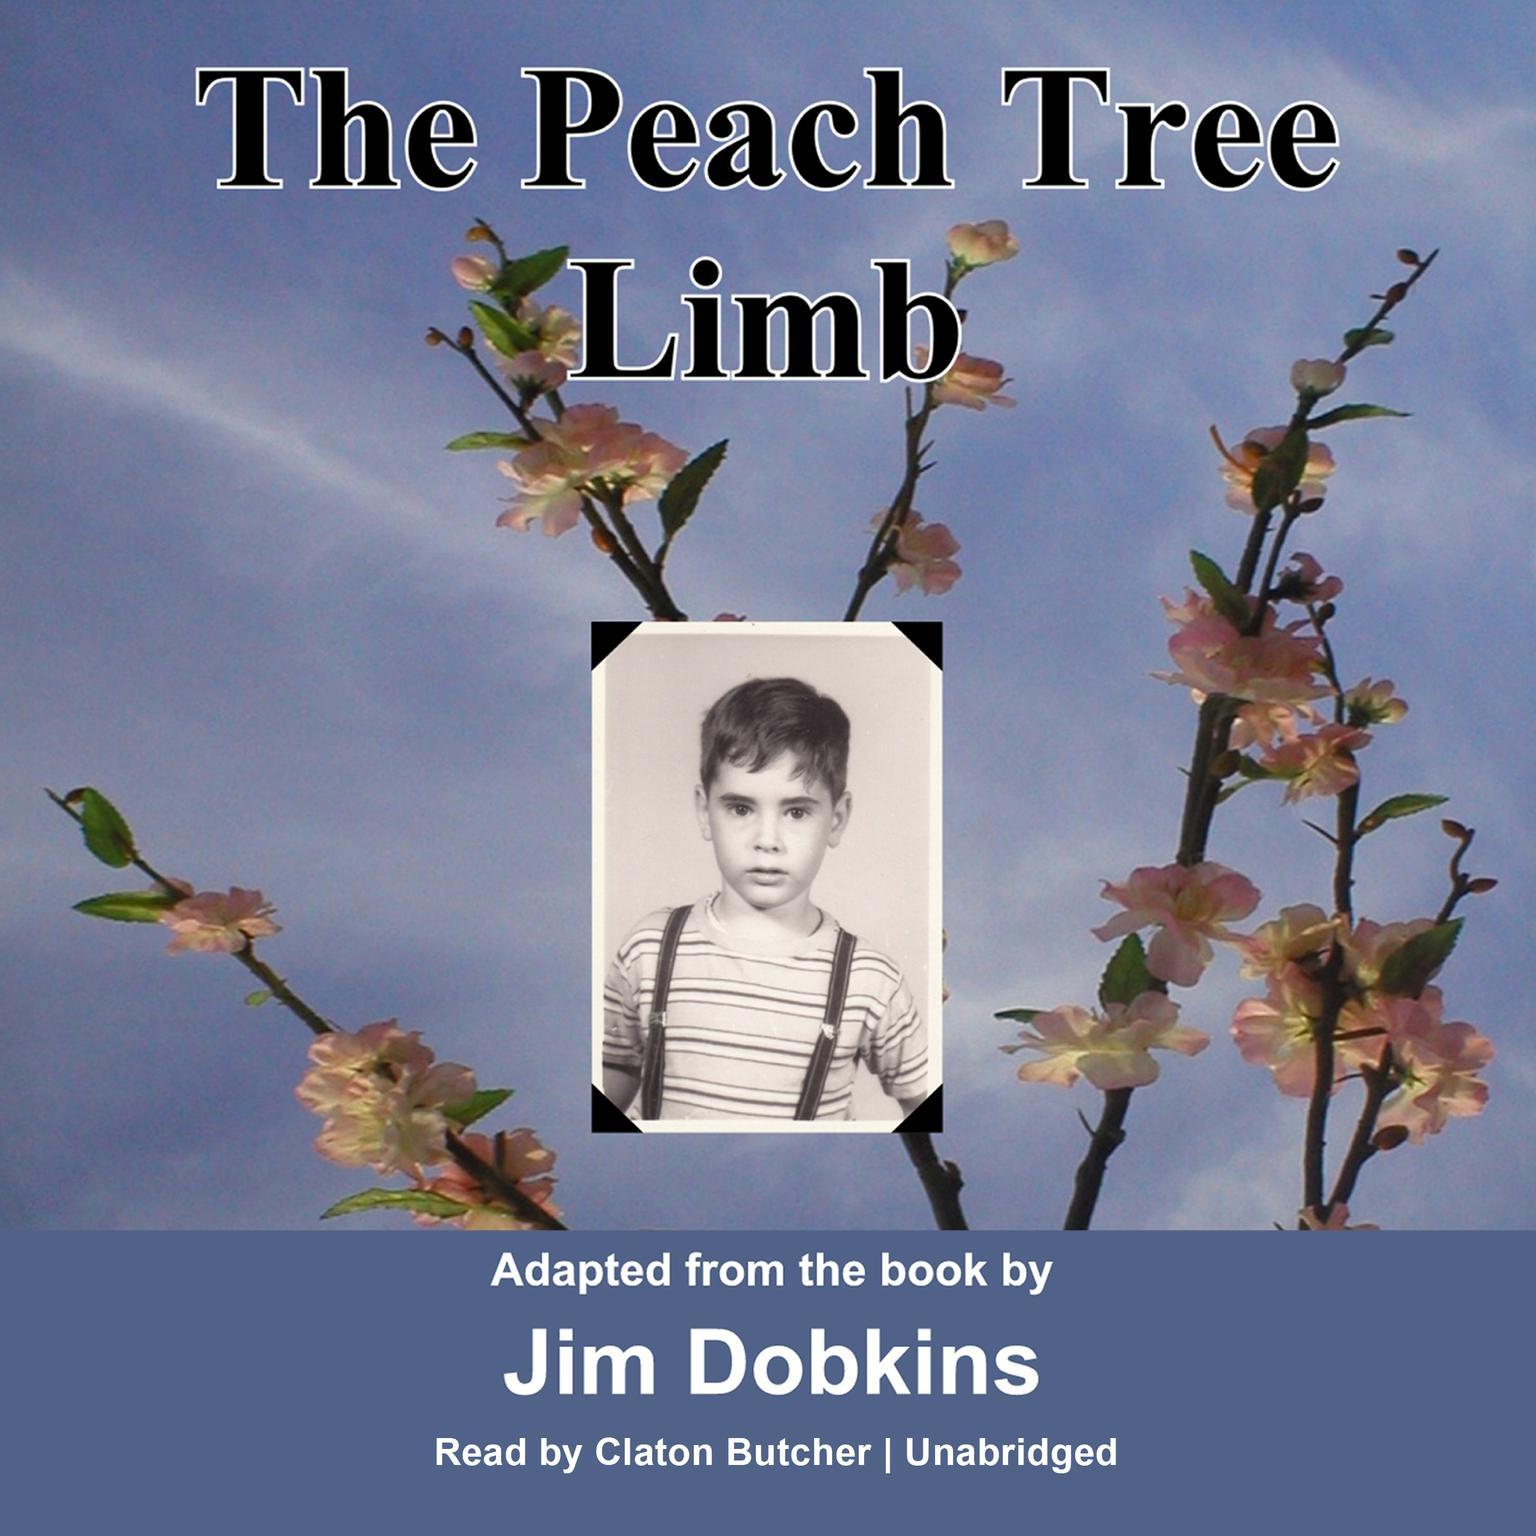 The Peach Tree Limb Audiobook, by Jim Dobkins